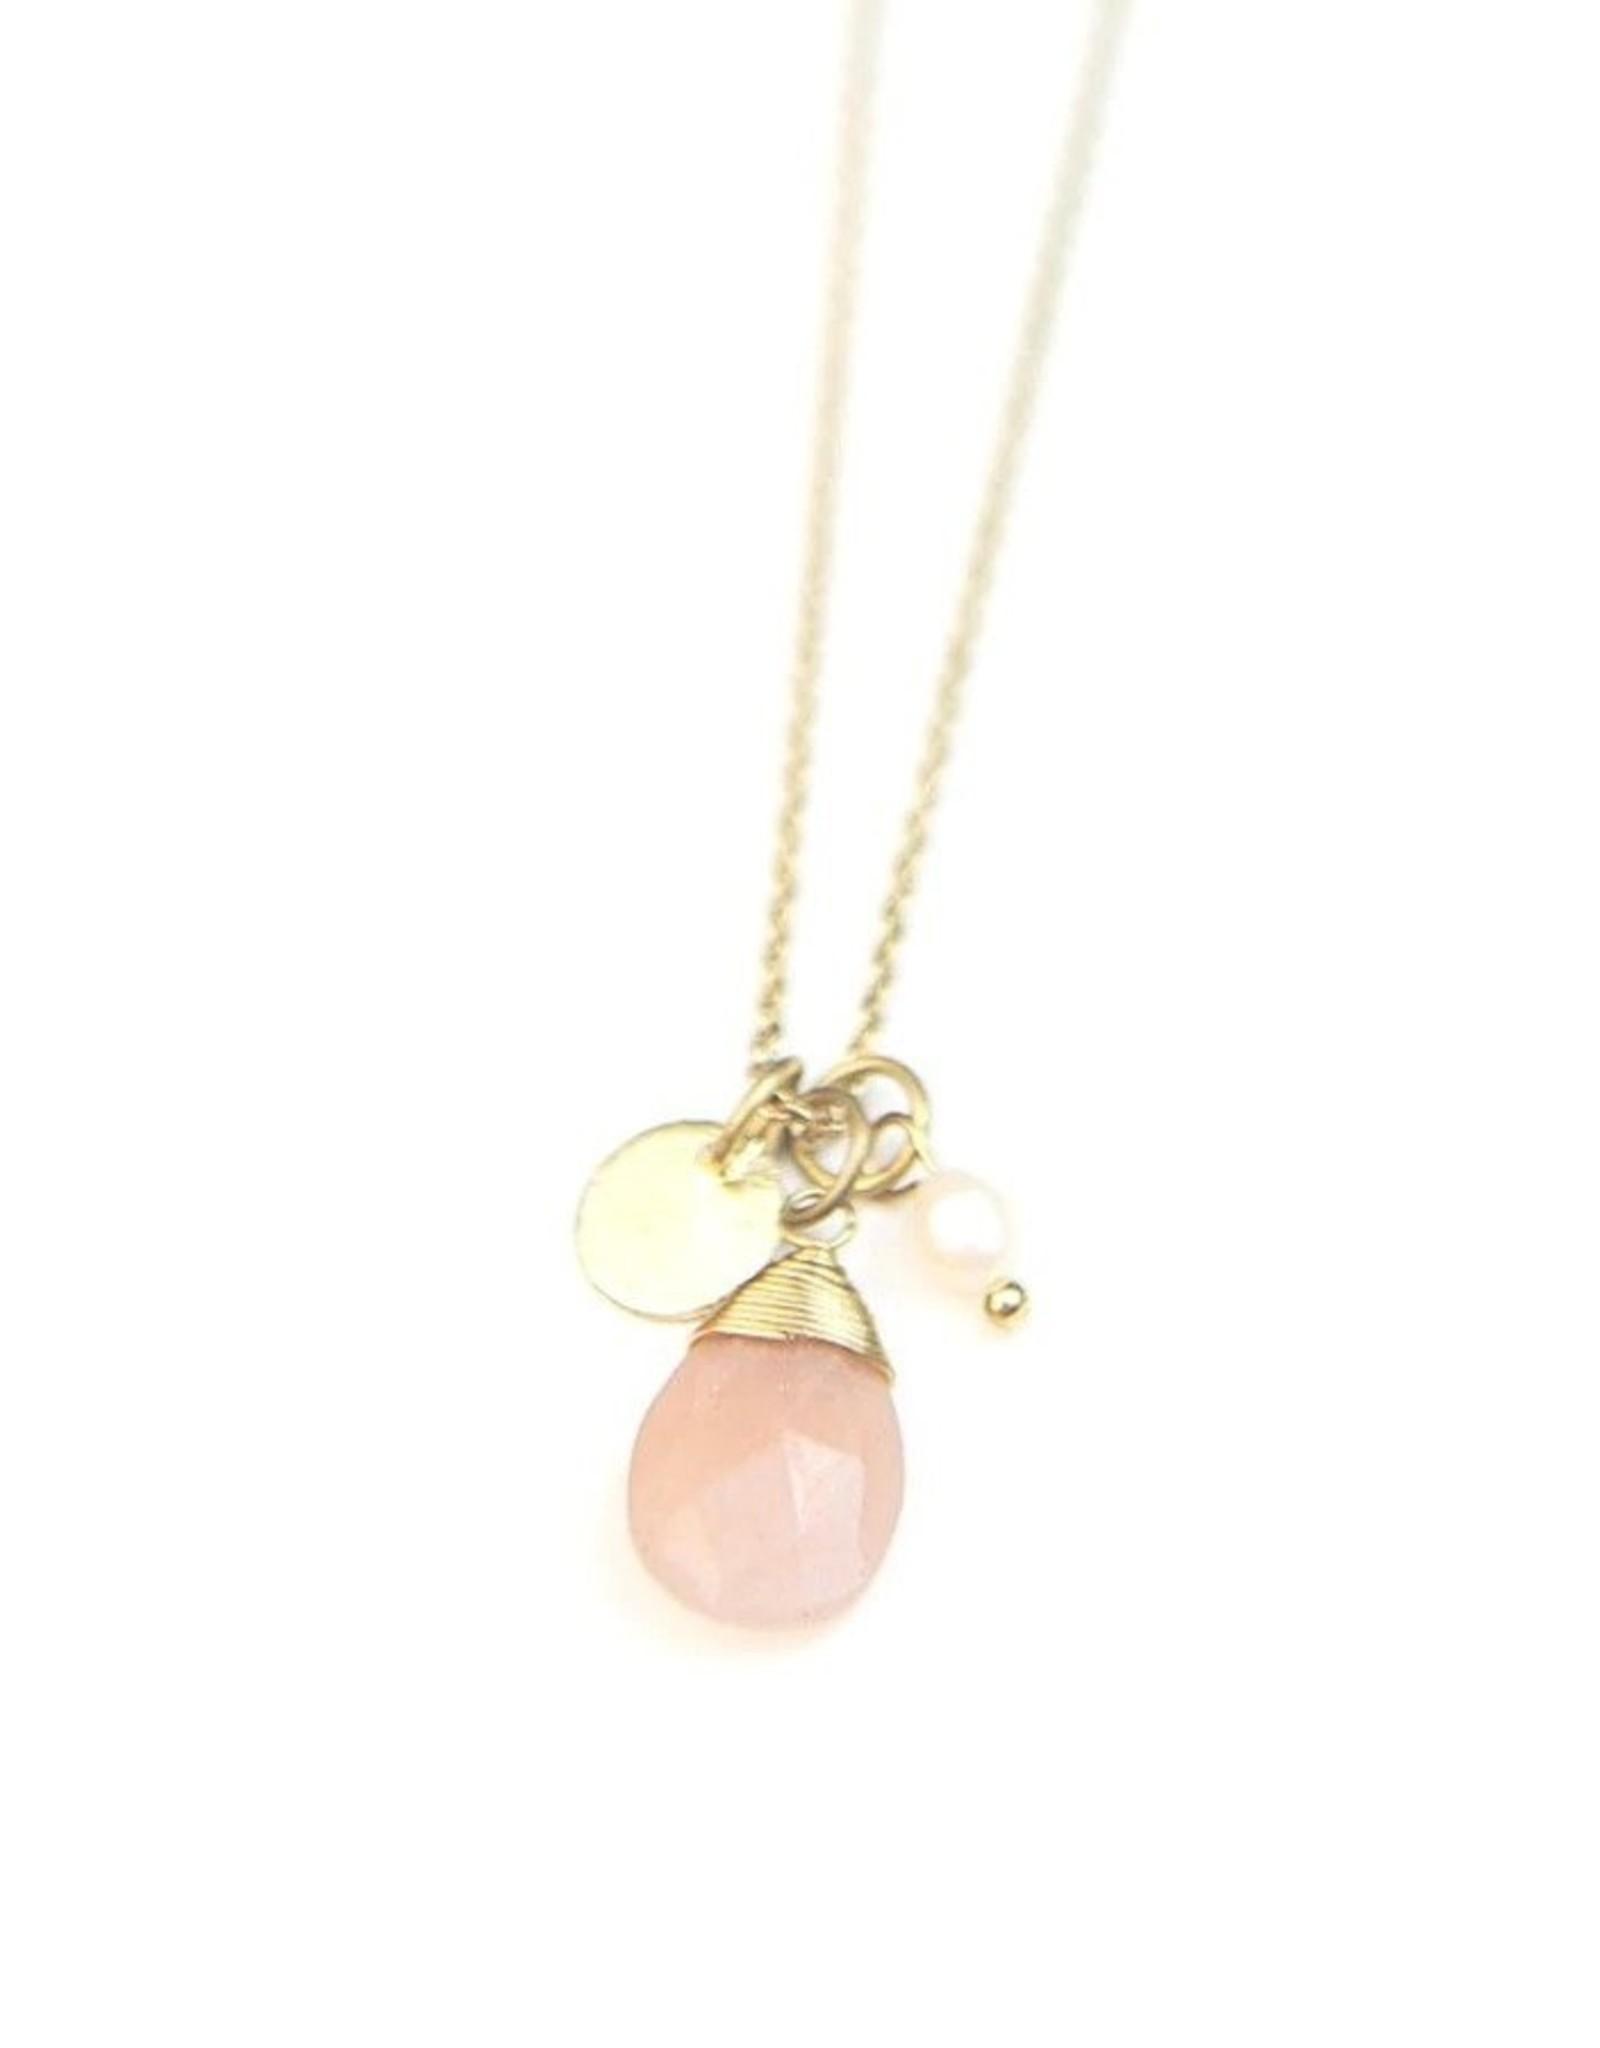 Tiny Treasures Necklace Brass